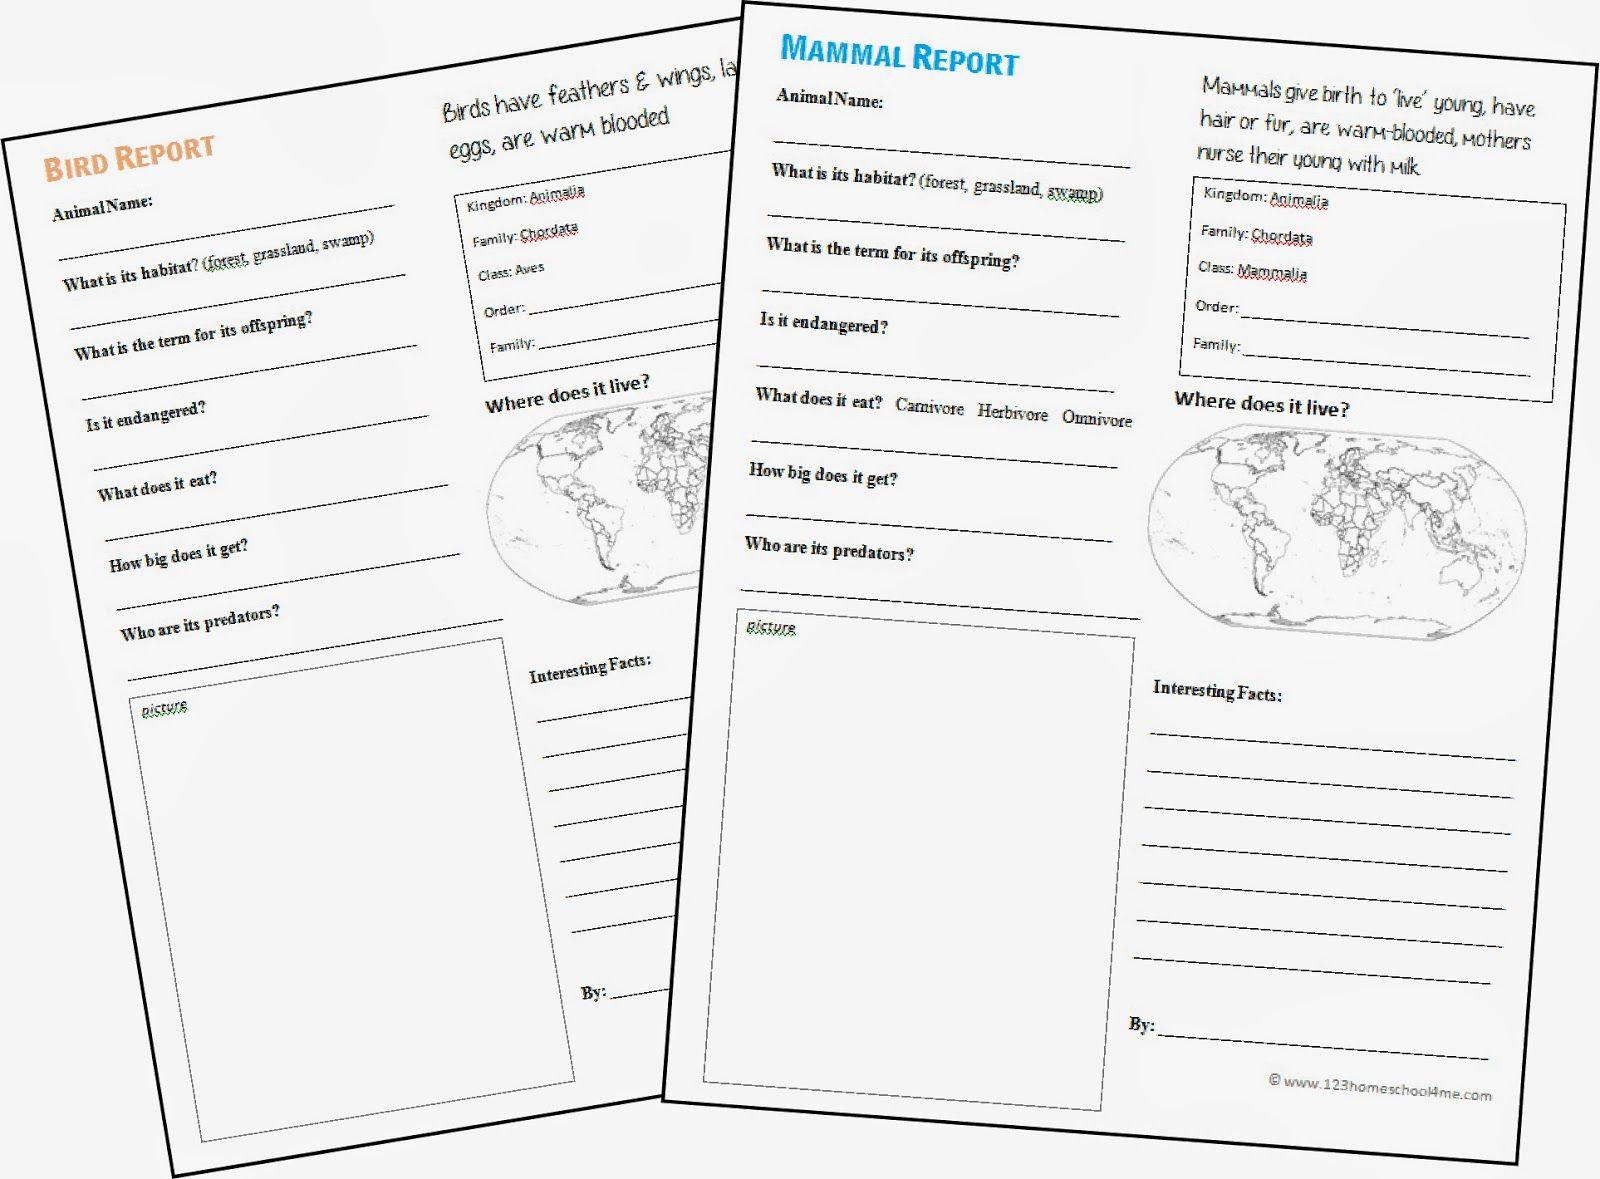 Free Animal Report Form Printable Animal Report Animal Report